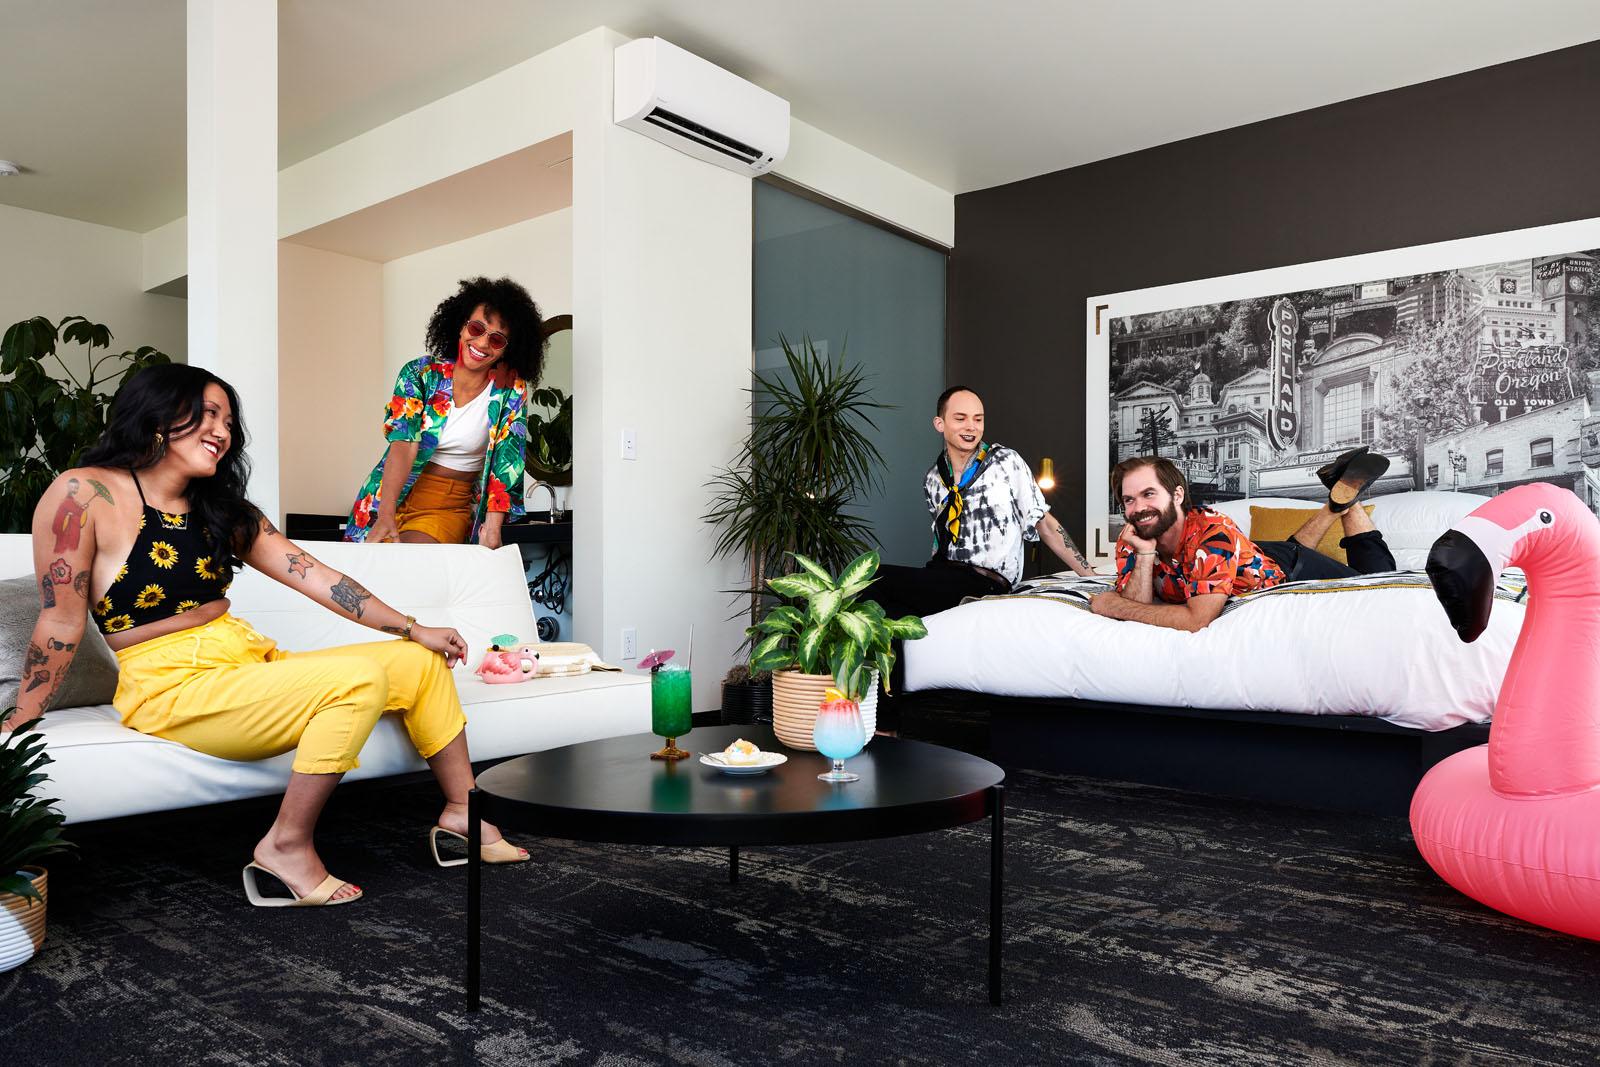 Dina Avila photography for Jupiter Hotel NEXT camp shot